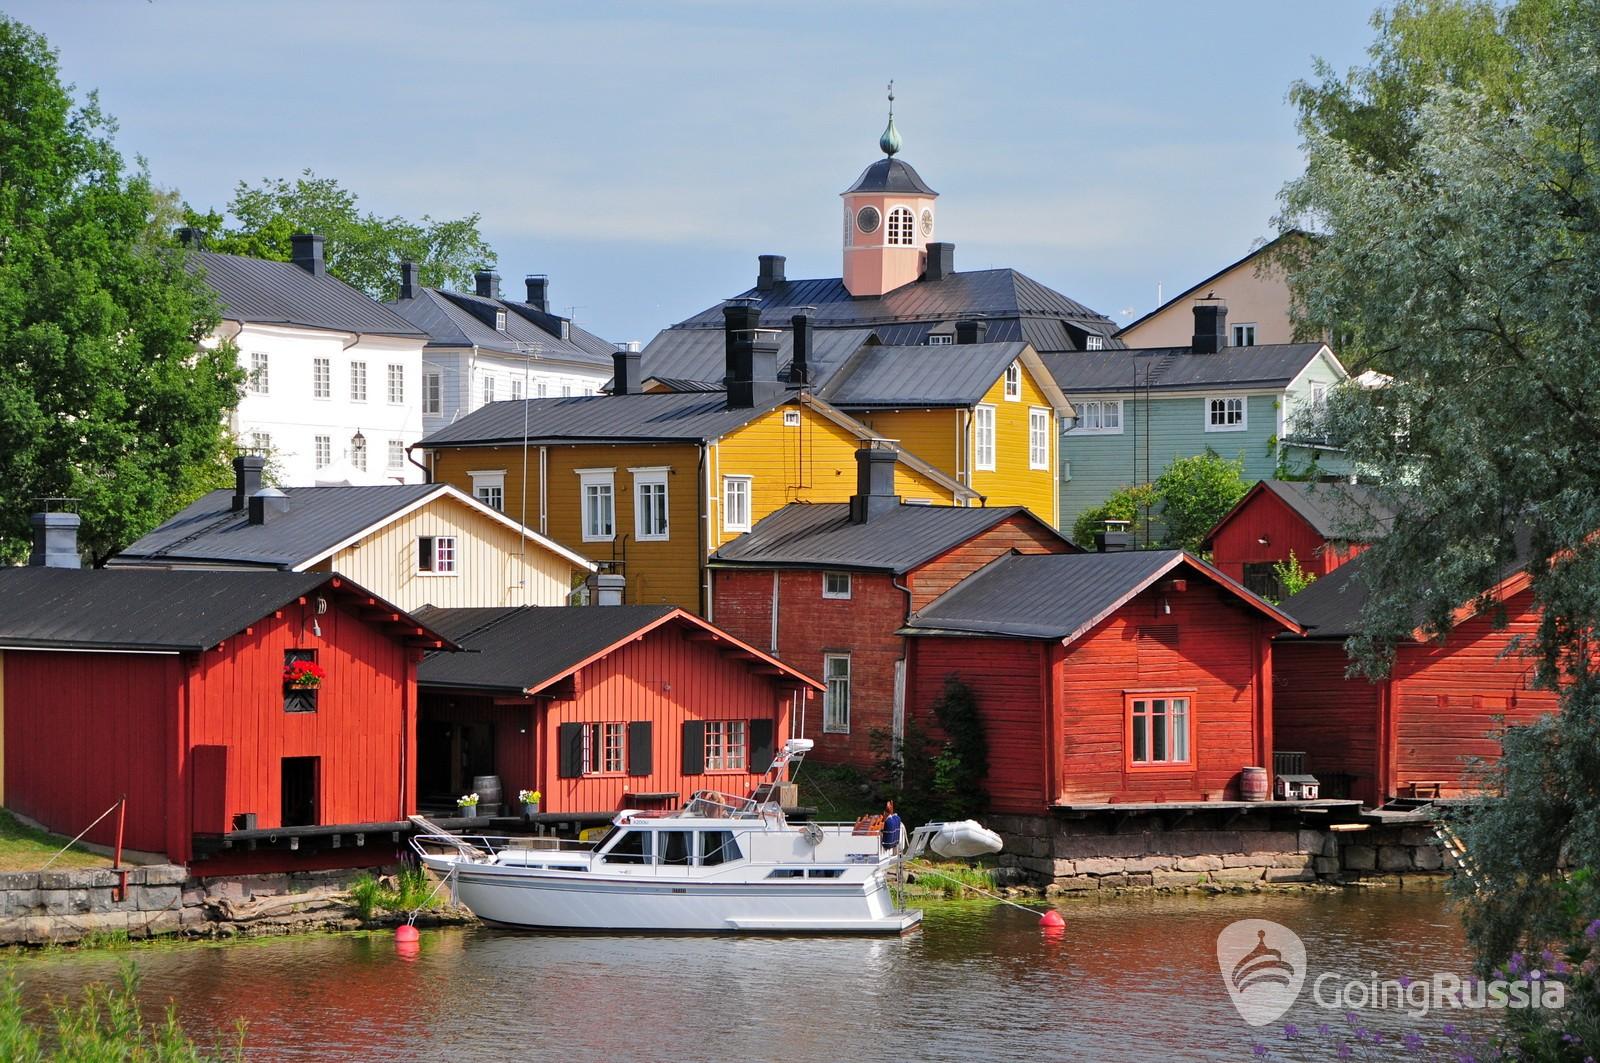 Finland_Porvoo_shutterstock_115332745